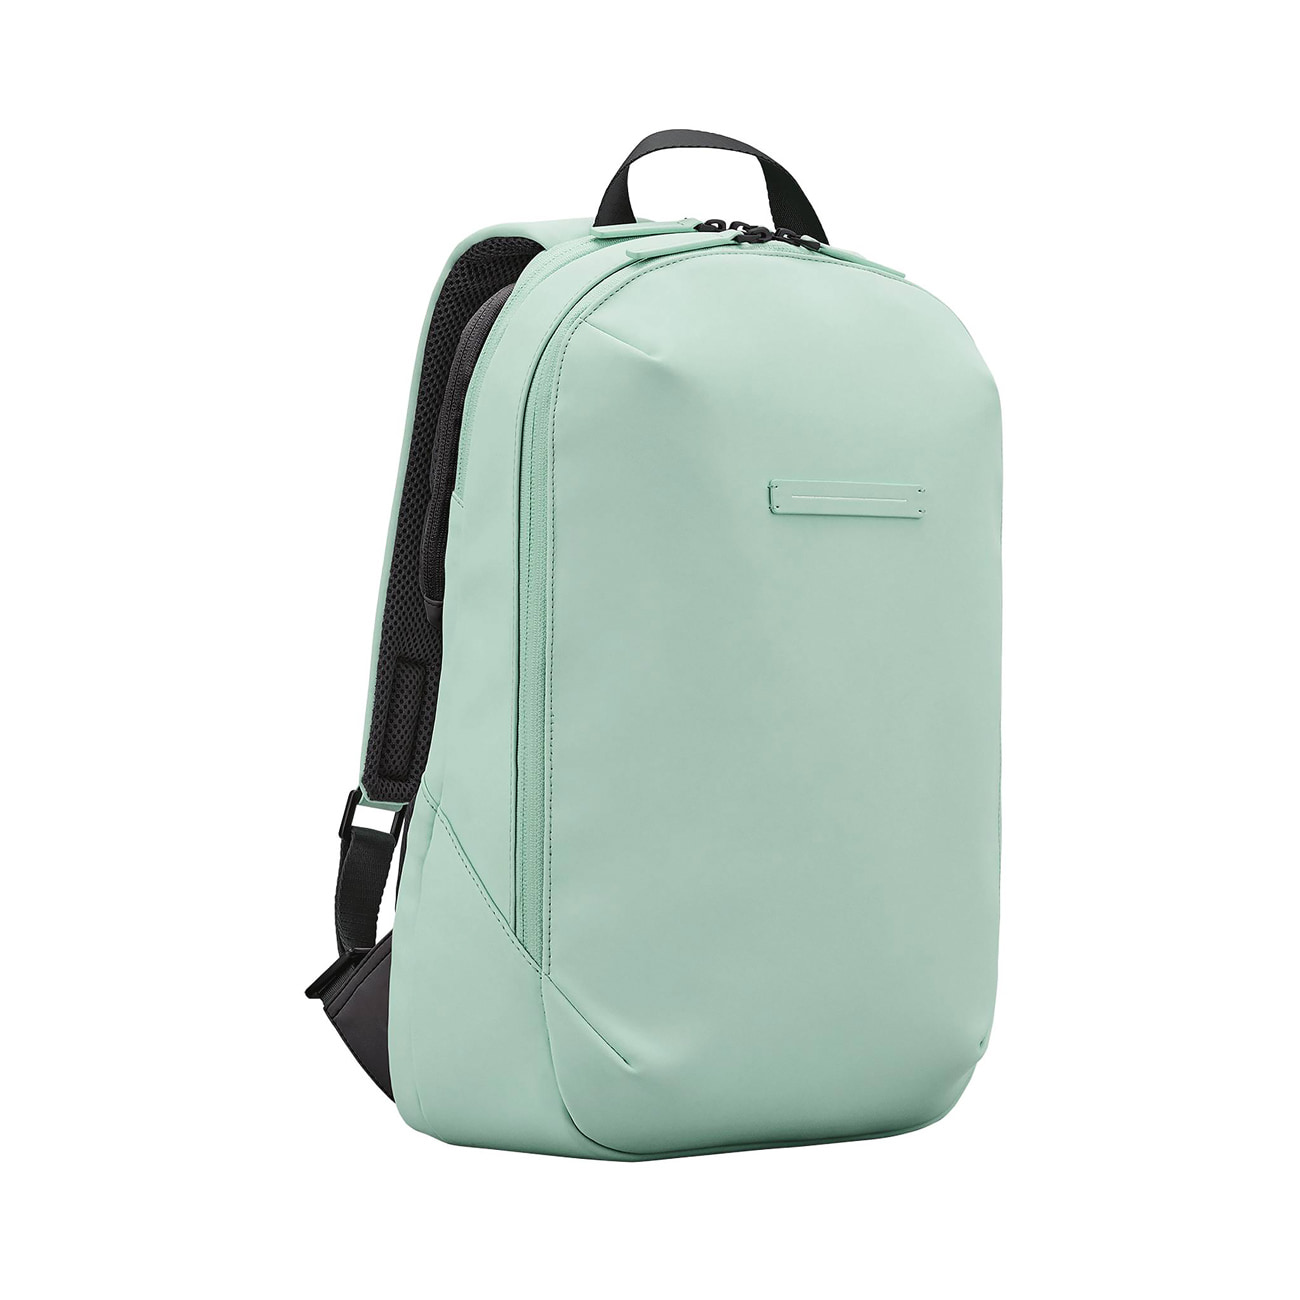 Minimalist Backpack for Women